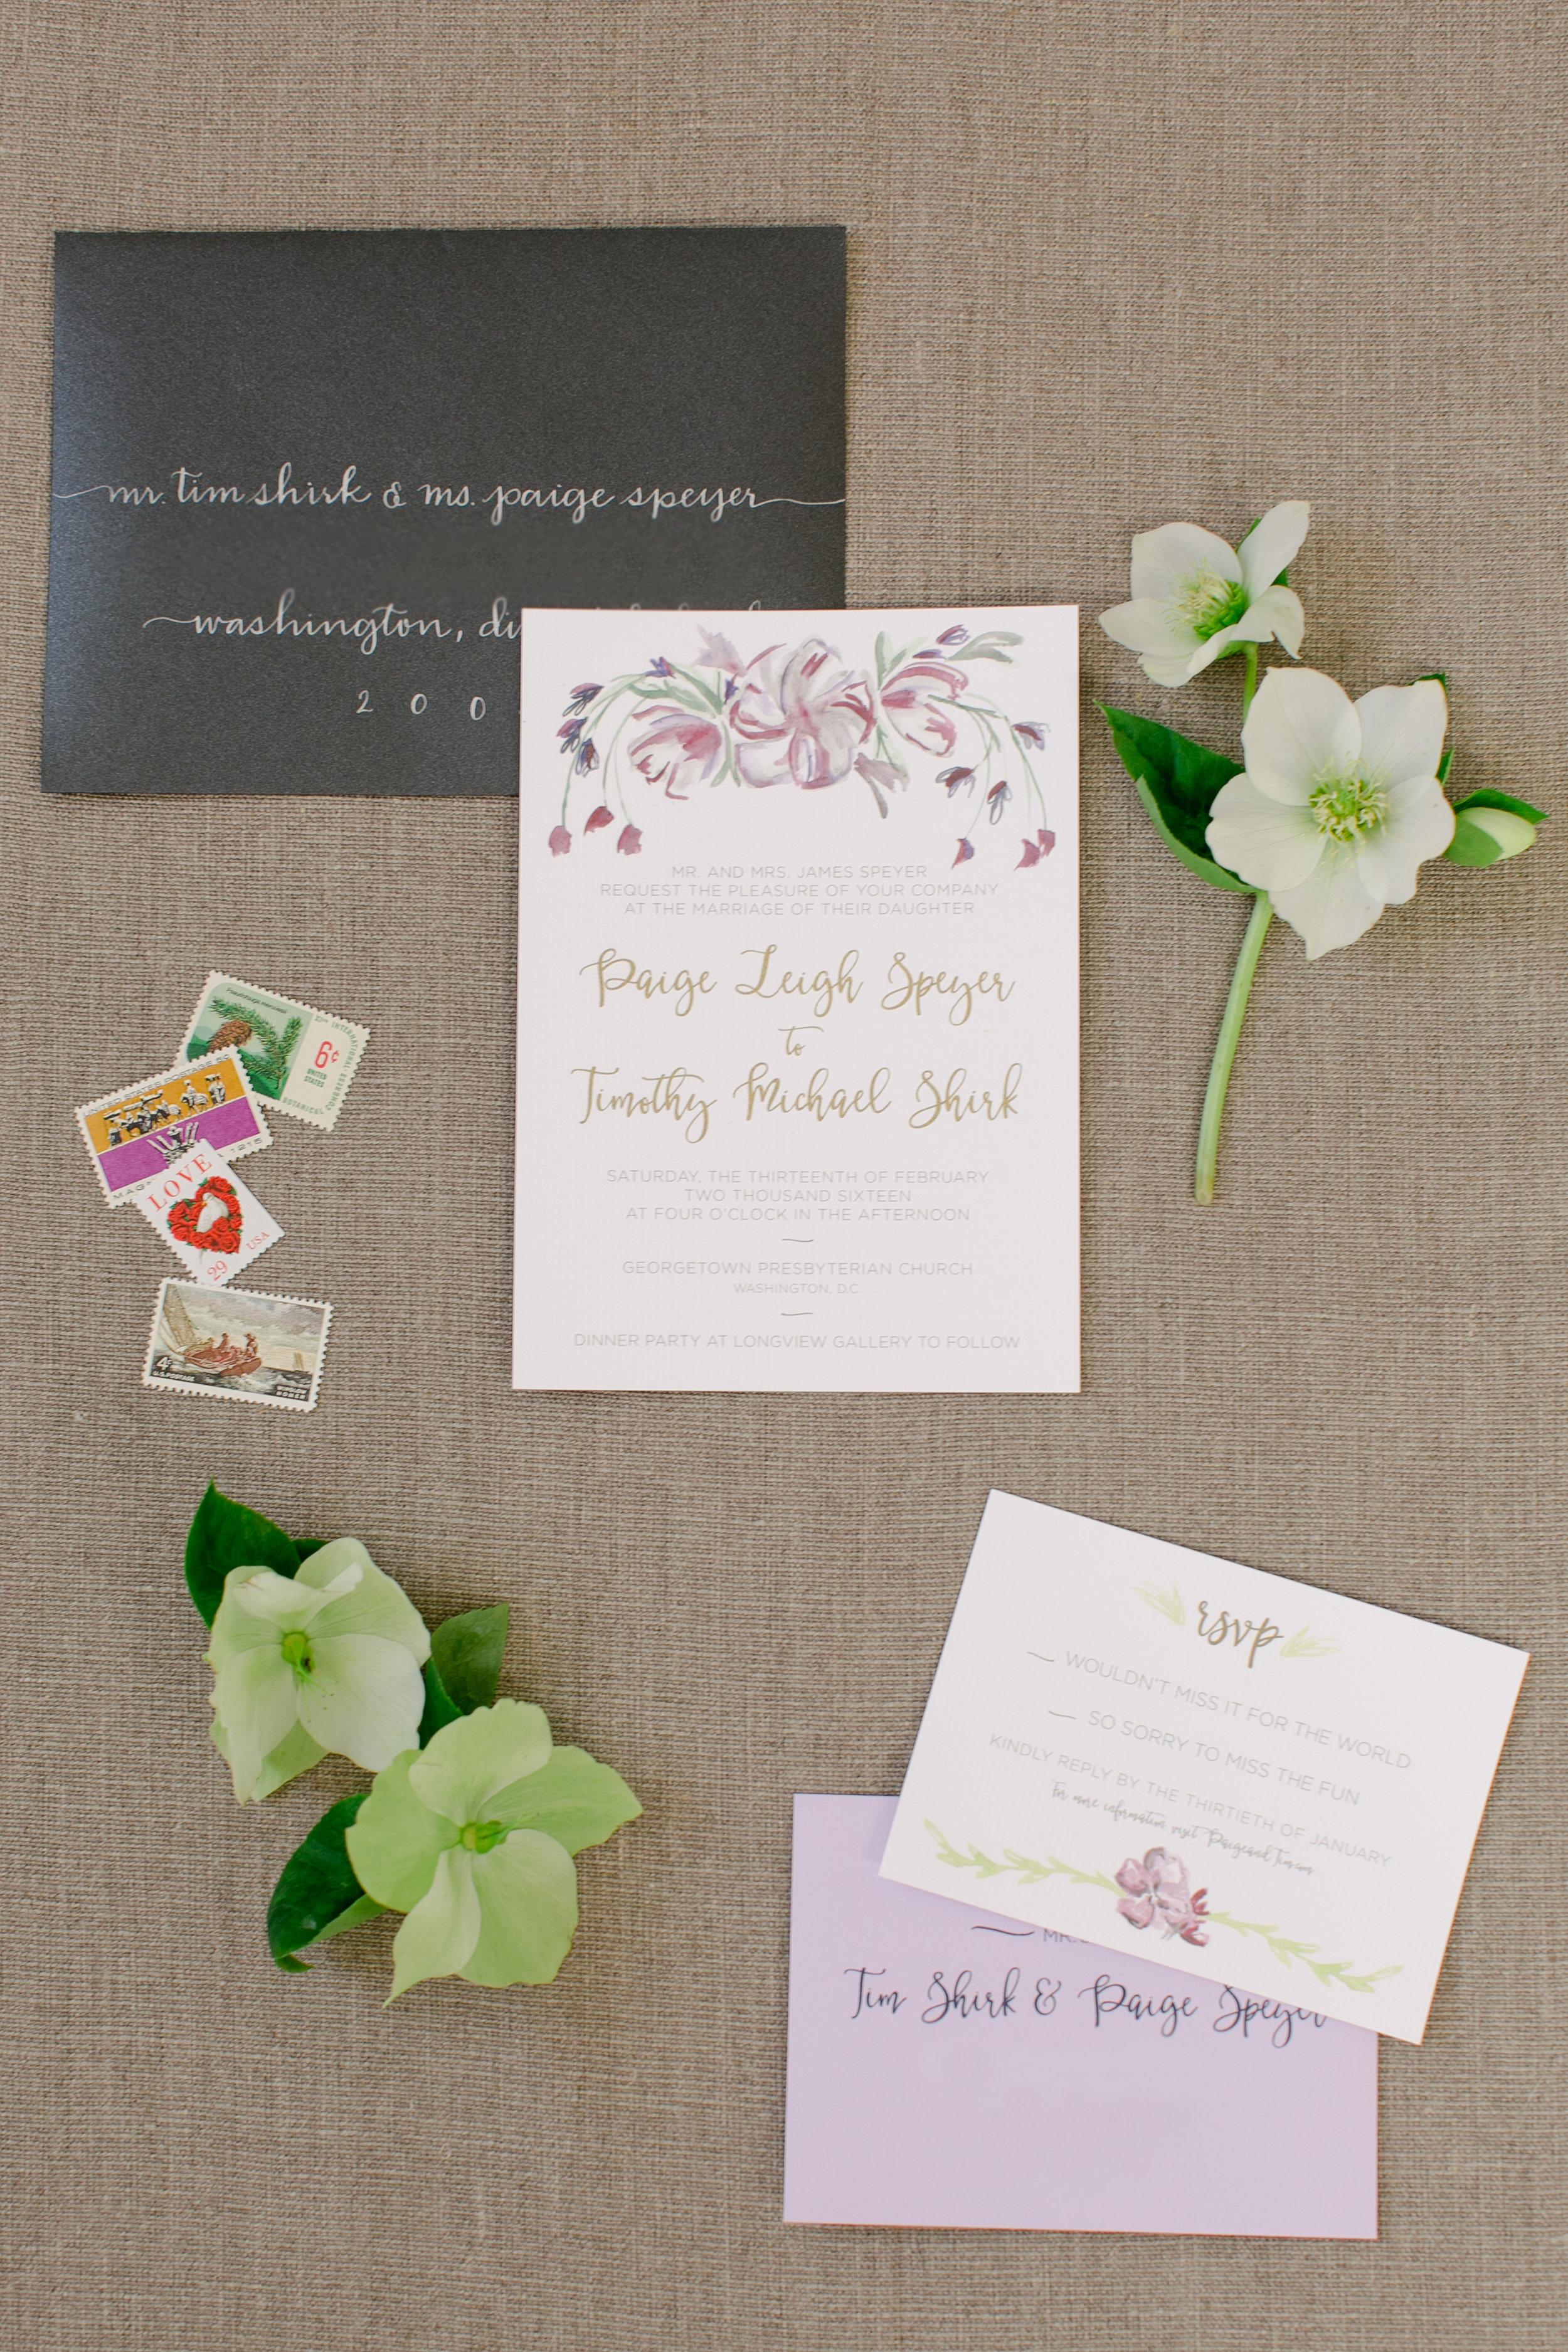 Type-A-Invitations-Kate-Headley-Wedding-Invitation-Suite-No-Address.jpg